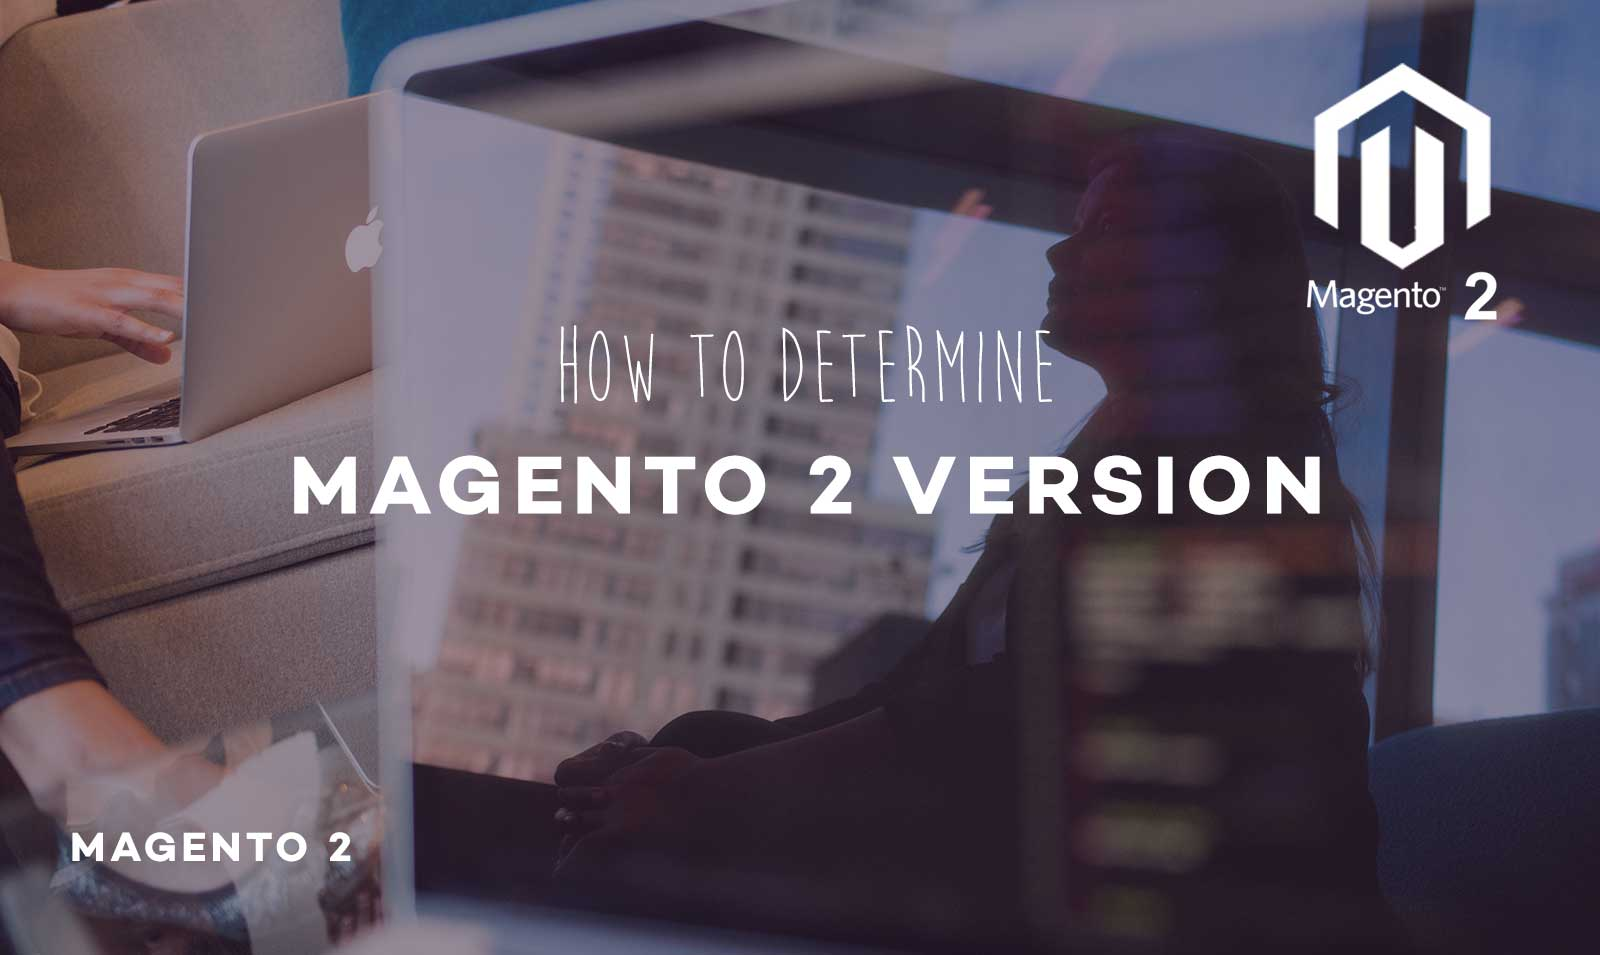 Magento 2 : How to get version of Magento 2?